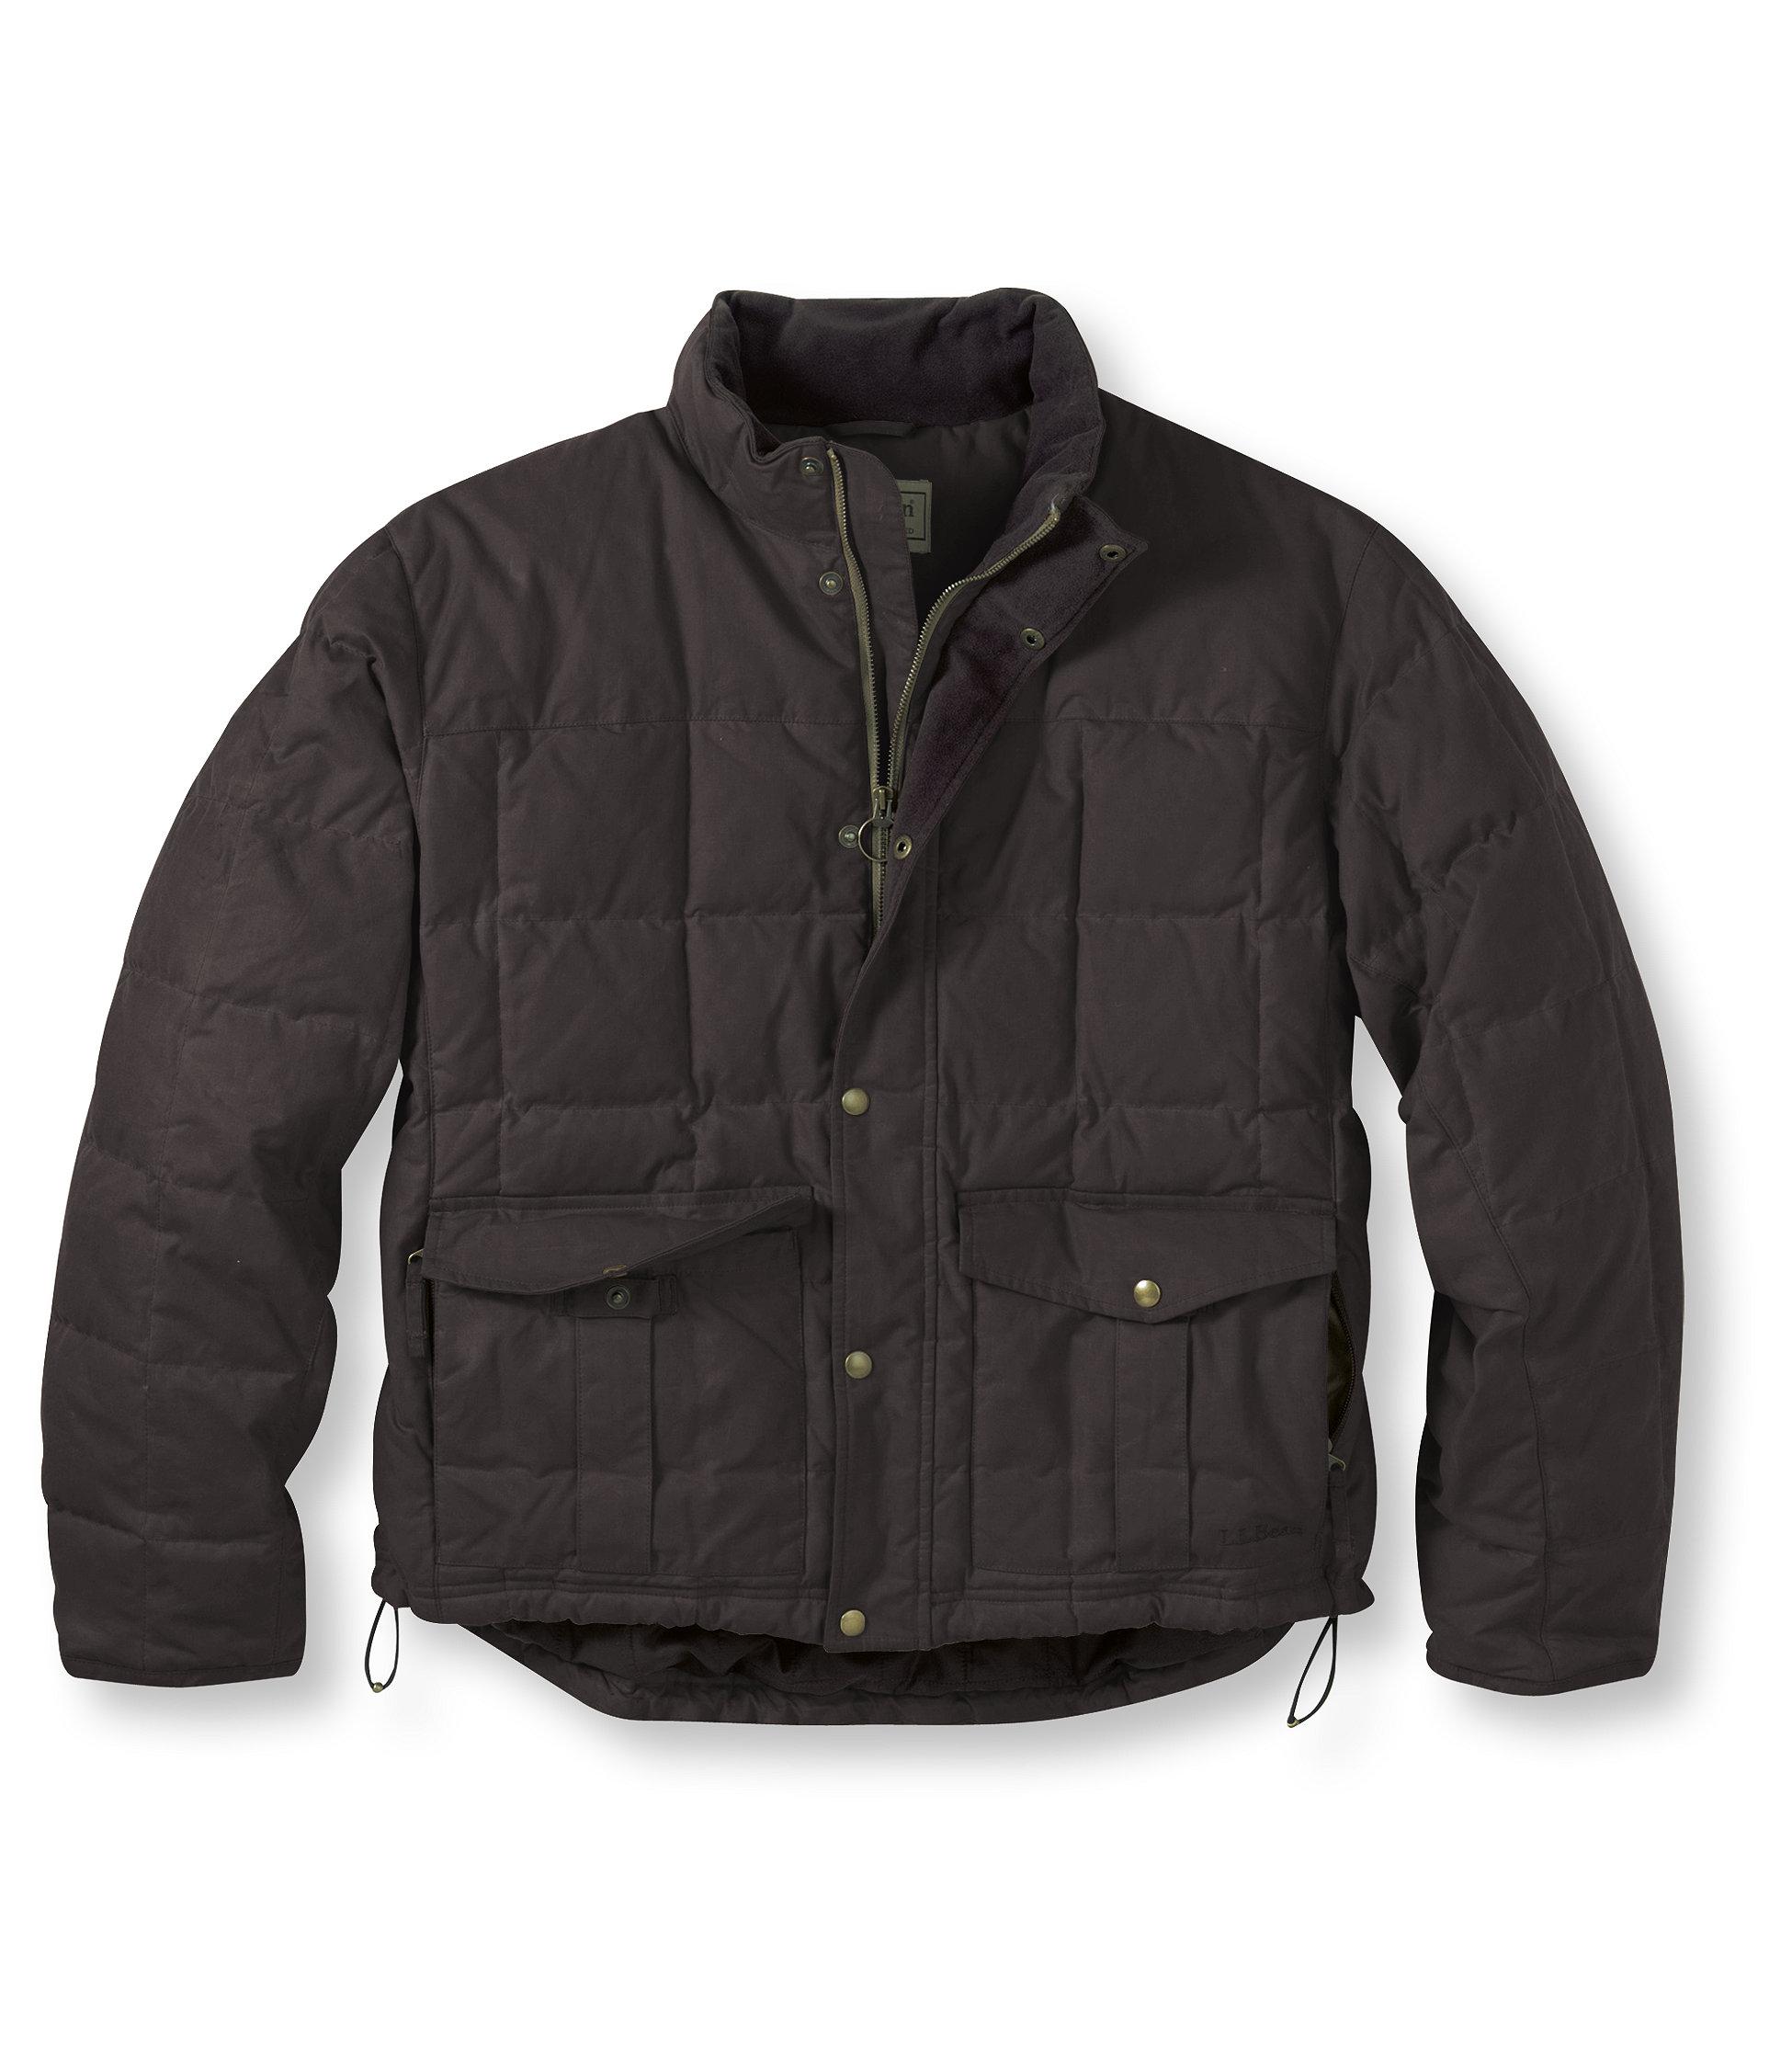 L.L.Bean Waxed Cotton Down Jacket